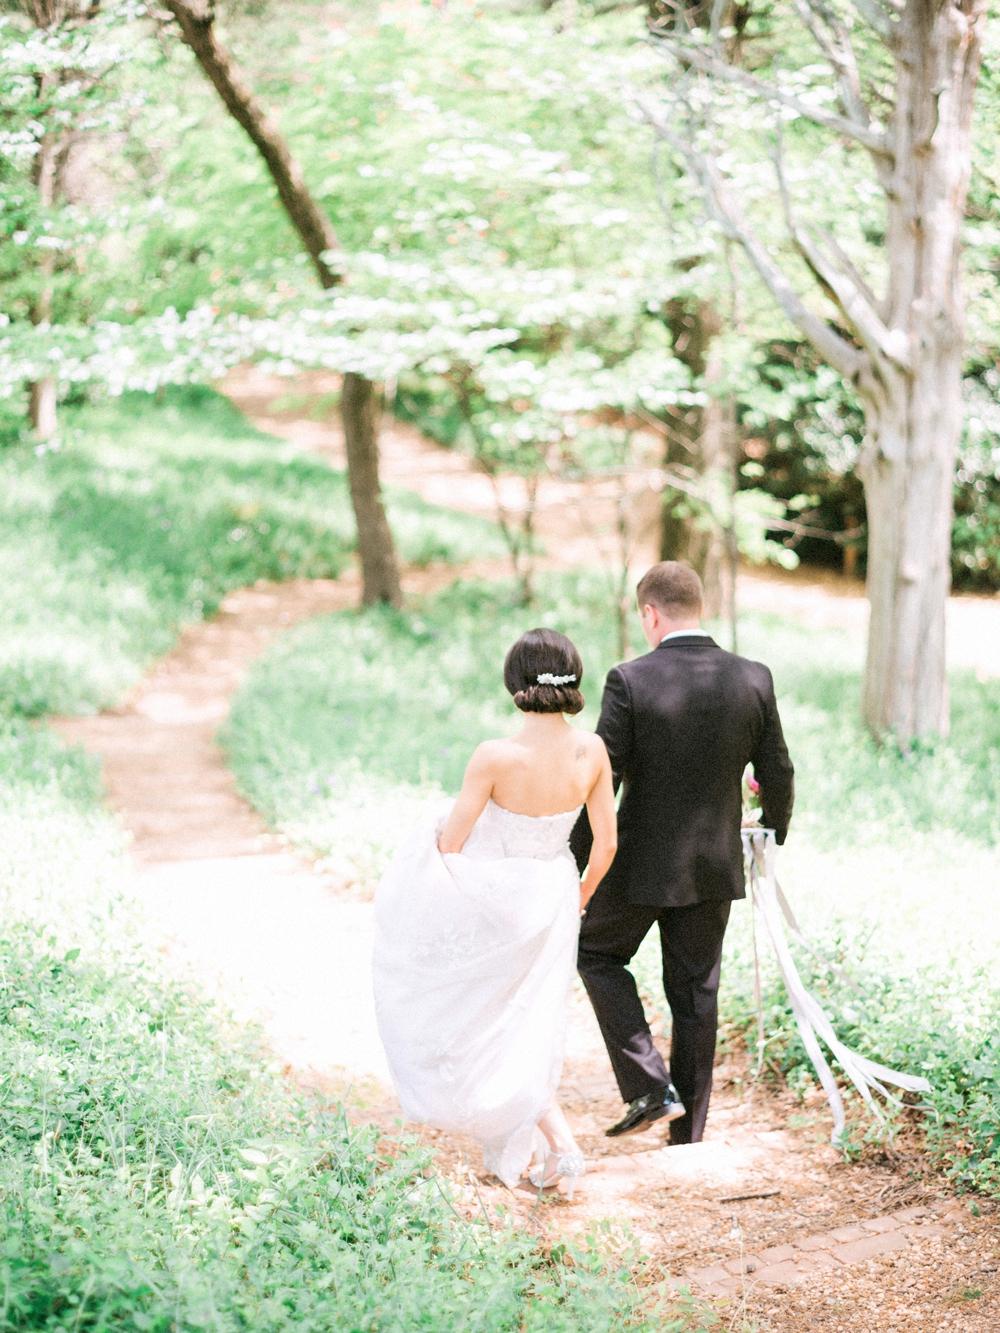 Barnsley Planation Wedding. Georgia Wedding Photographer_0073.jpg